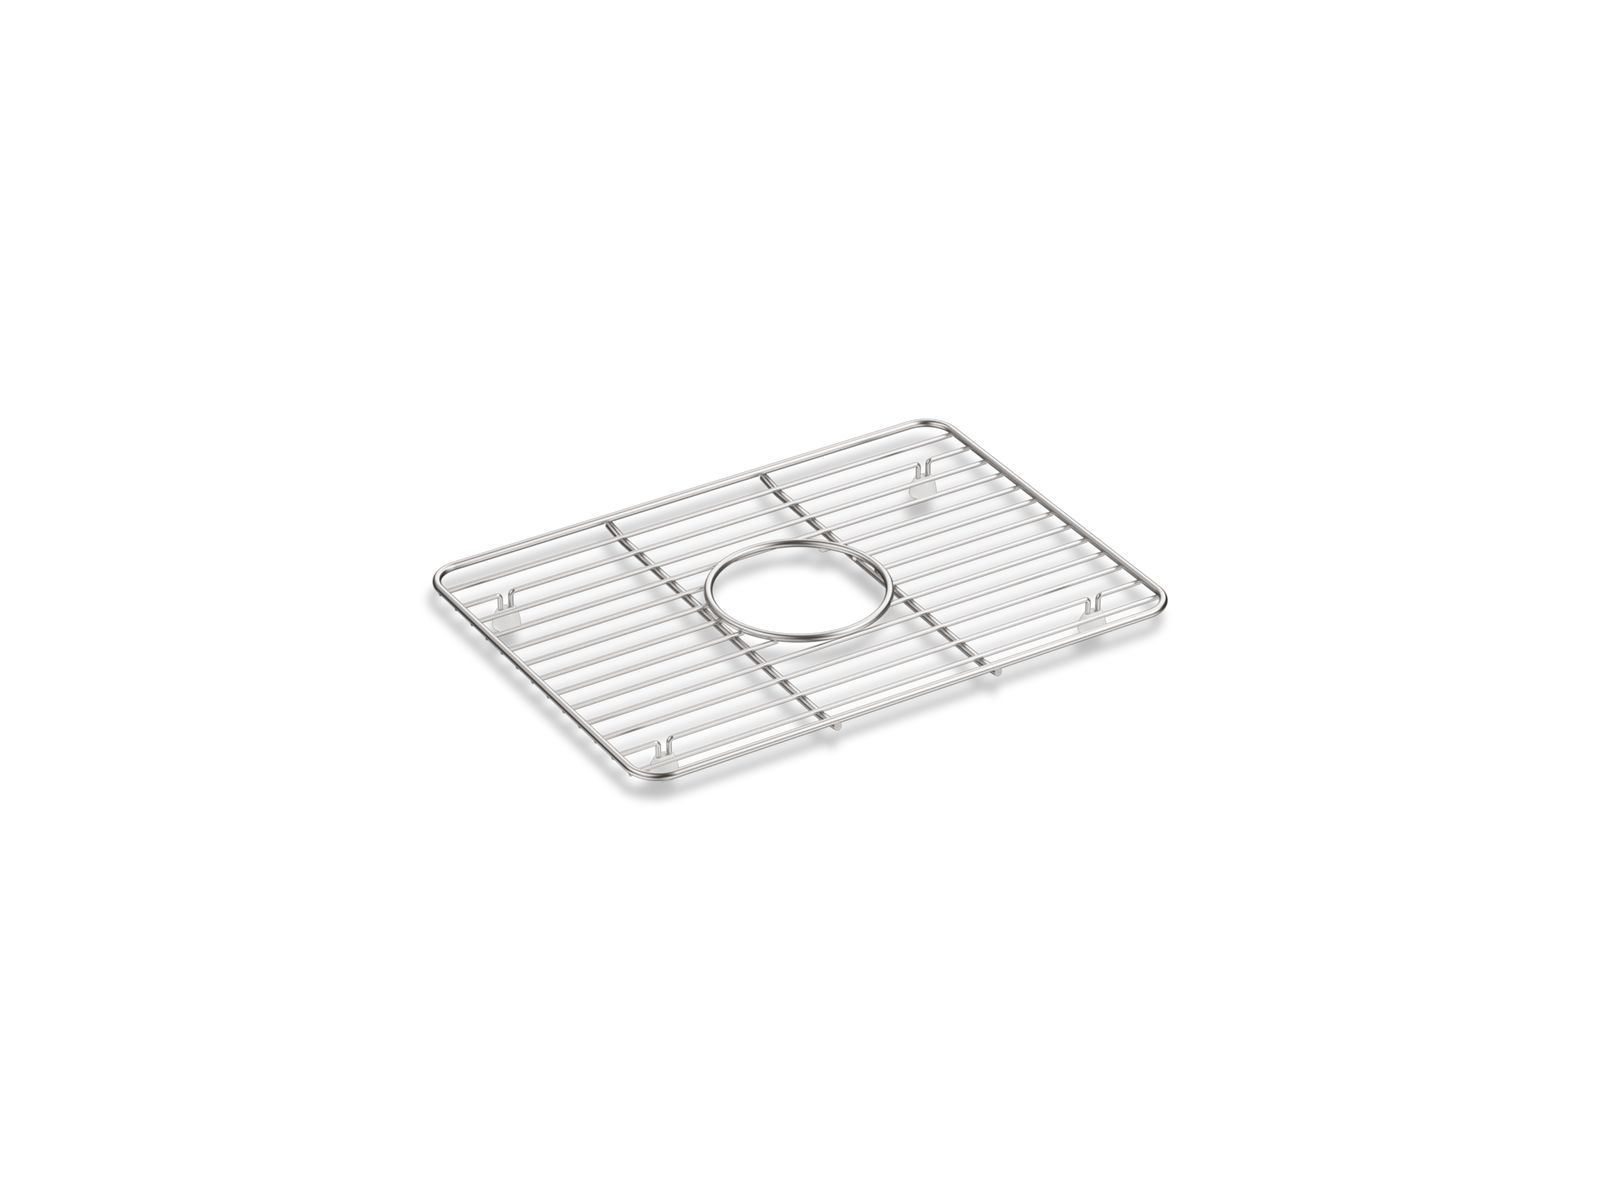 K-5198-ST | Cairn Sink Rack for Small Bowl | KOHLER | Kitchen Sink ...